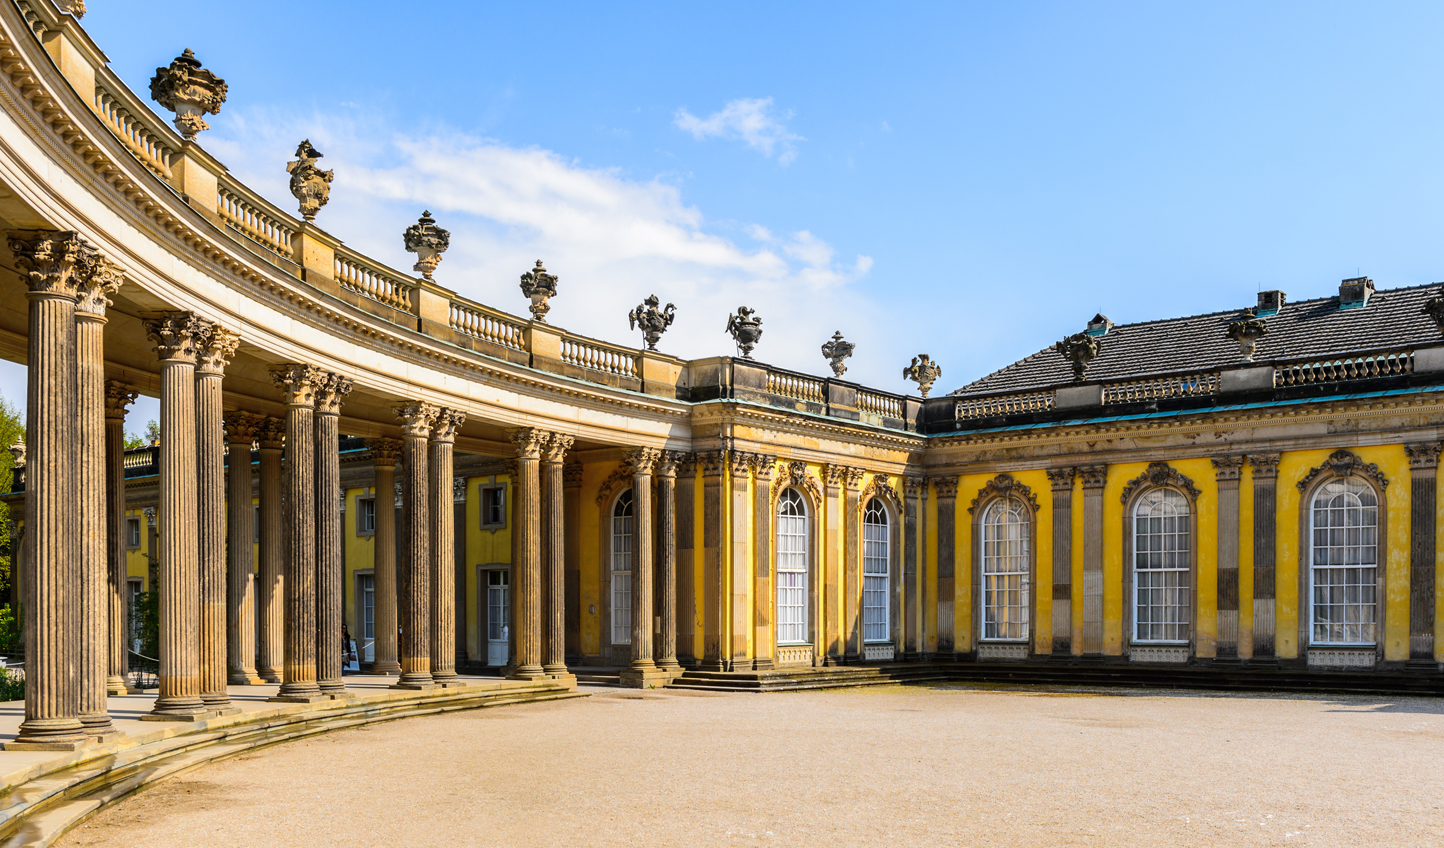 Stroll through the Rococo architecture of Schloss Sanssouci